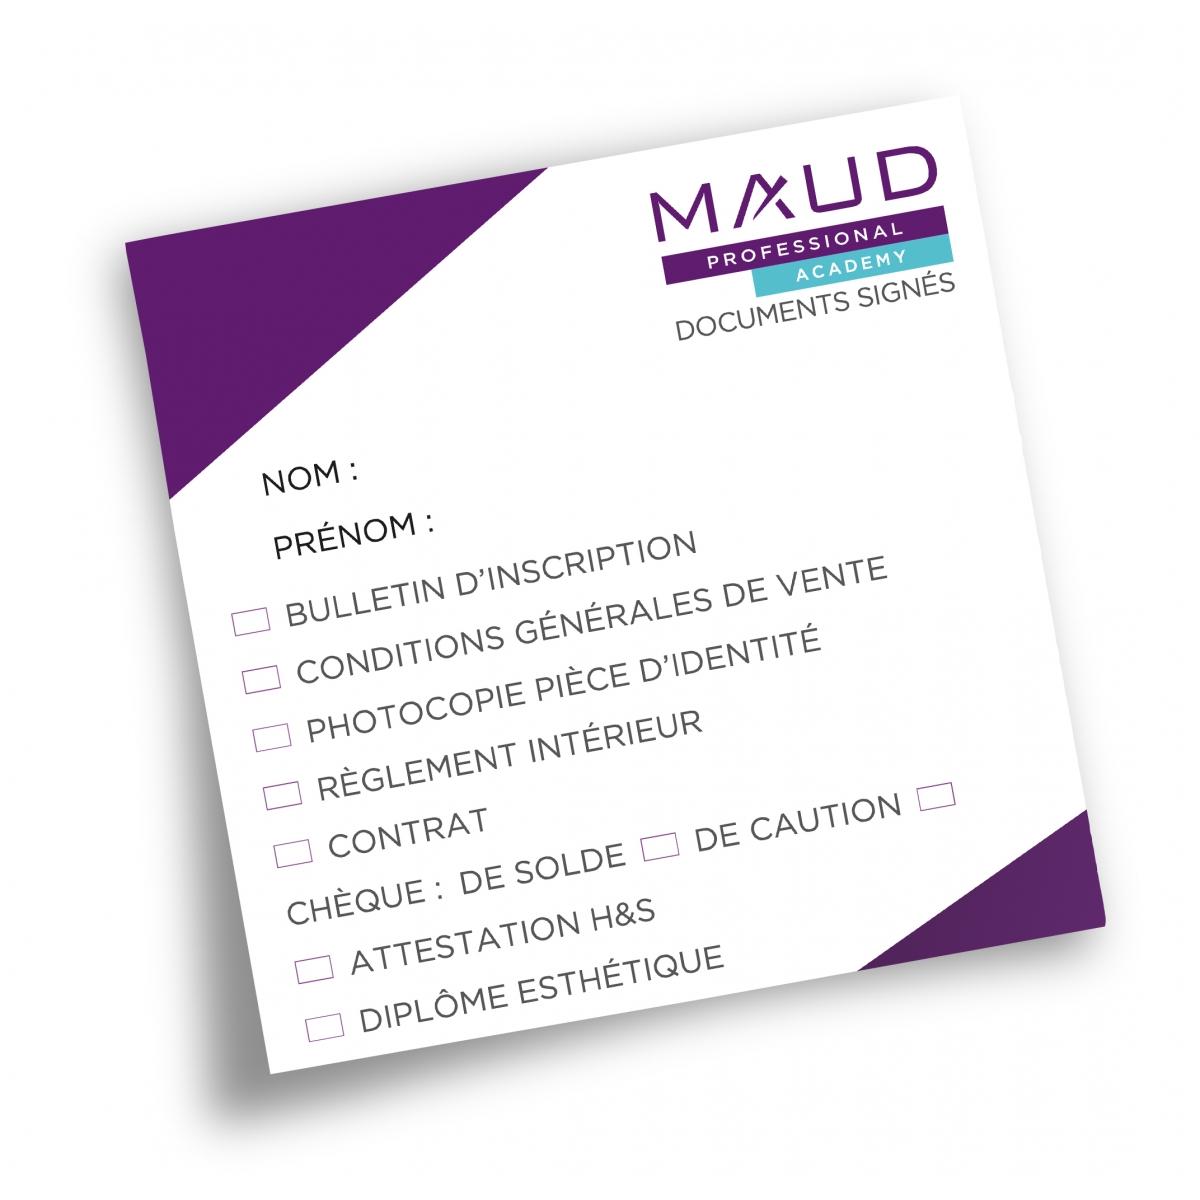 ACADEMIES - MAUD PROFESSIONAL SHOP - POST-IT MAUD ACADEMY (x25)